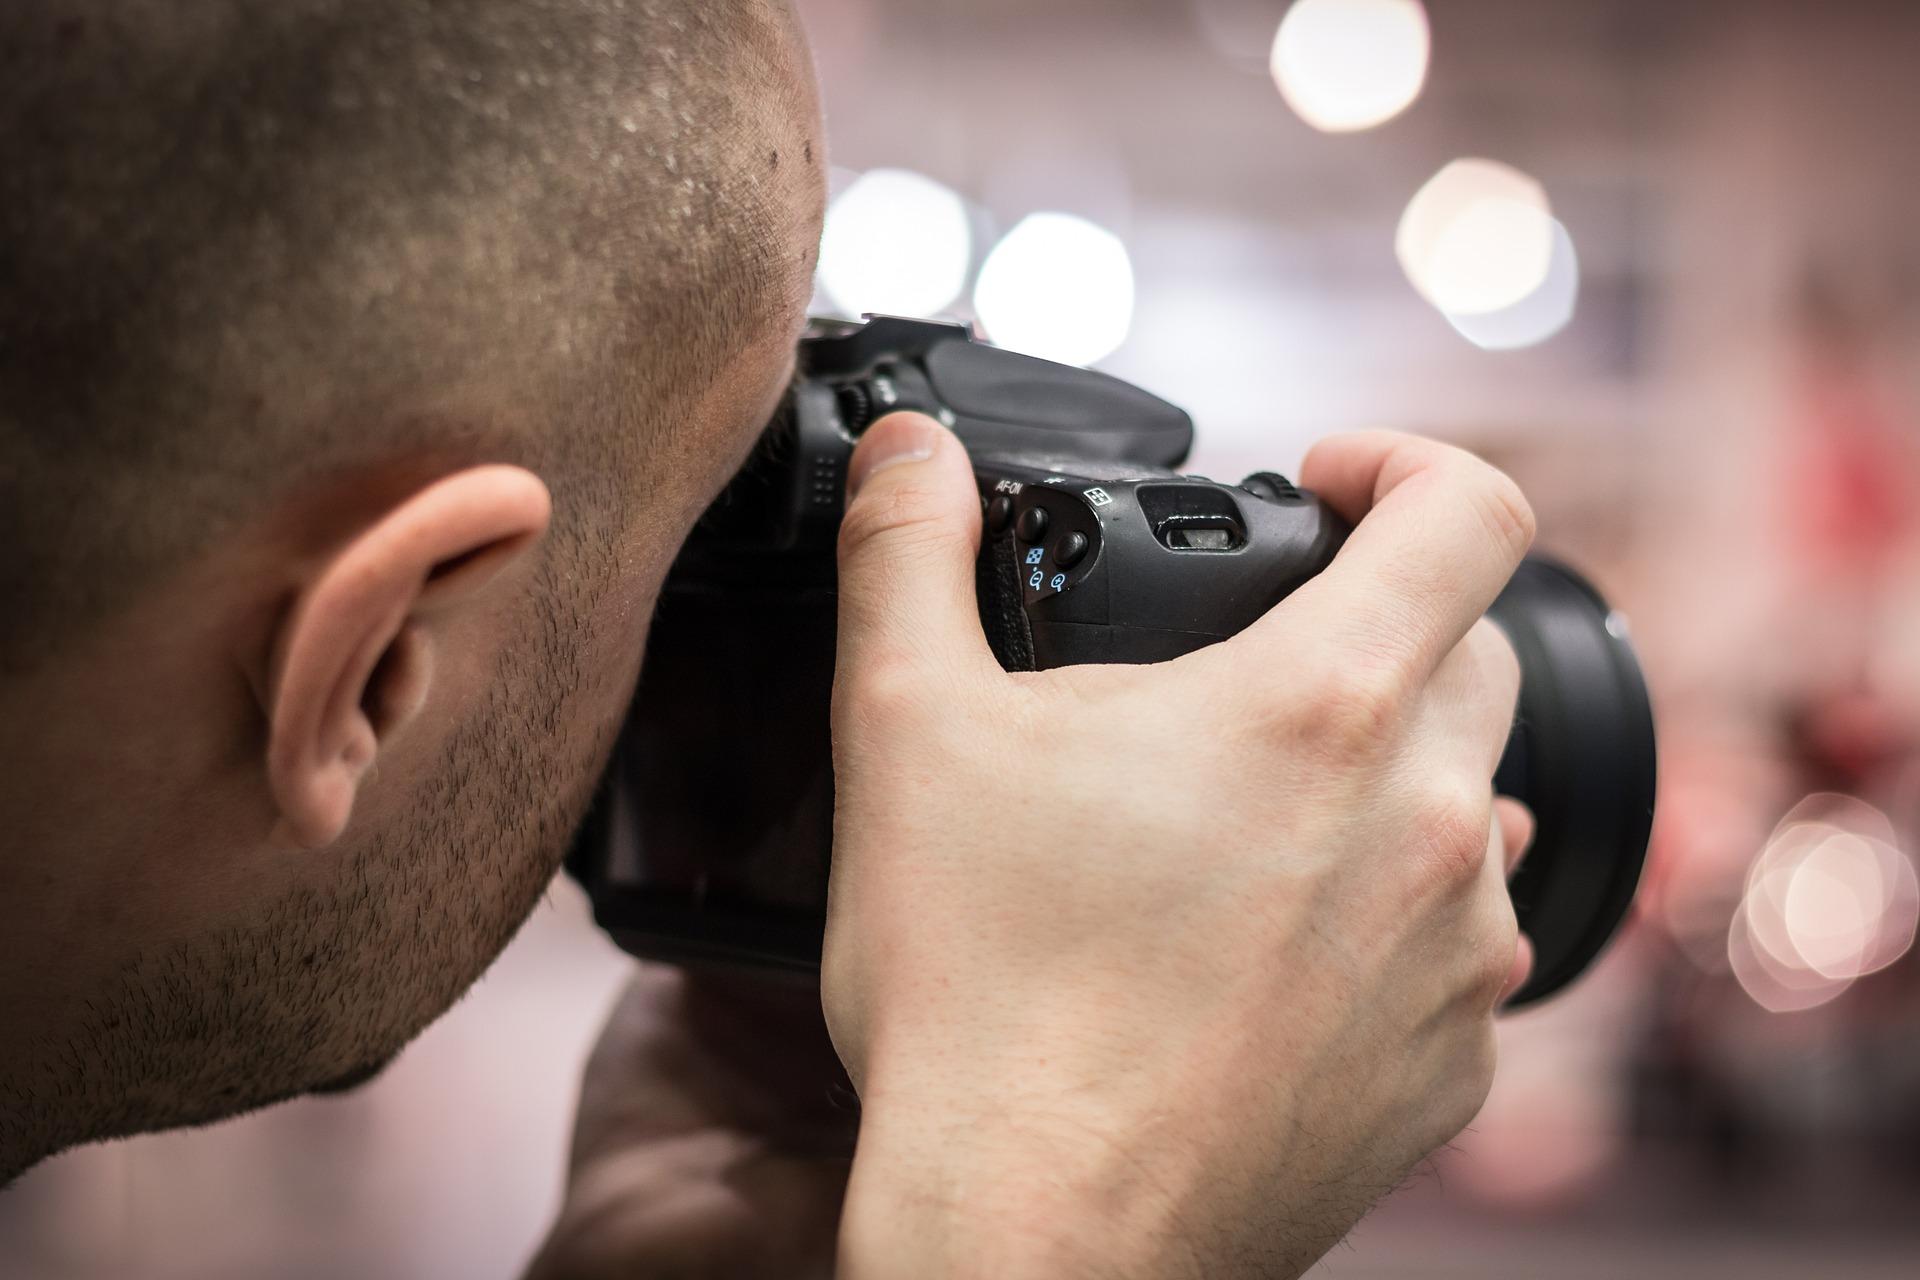 kako fotografirati nepremičnino